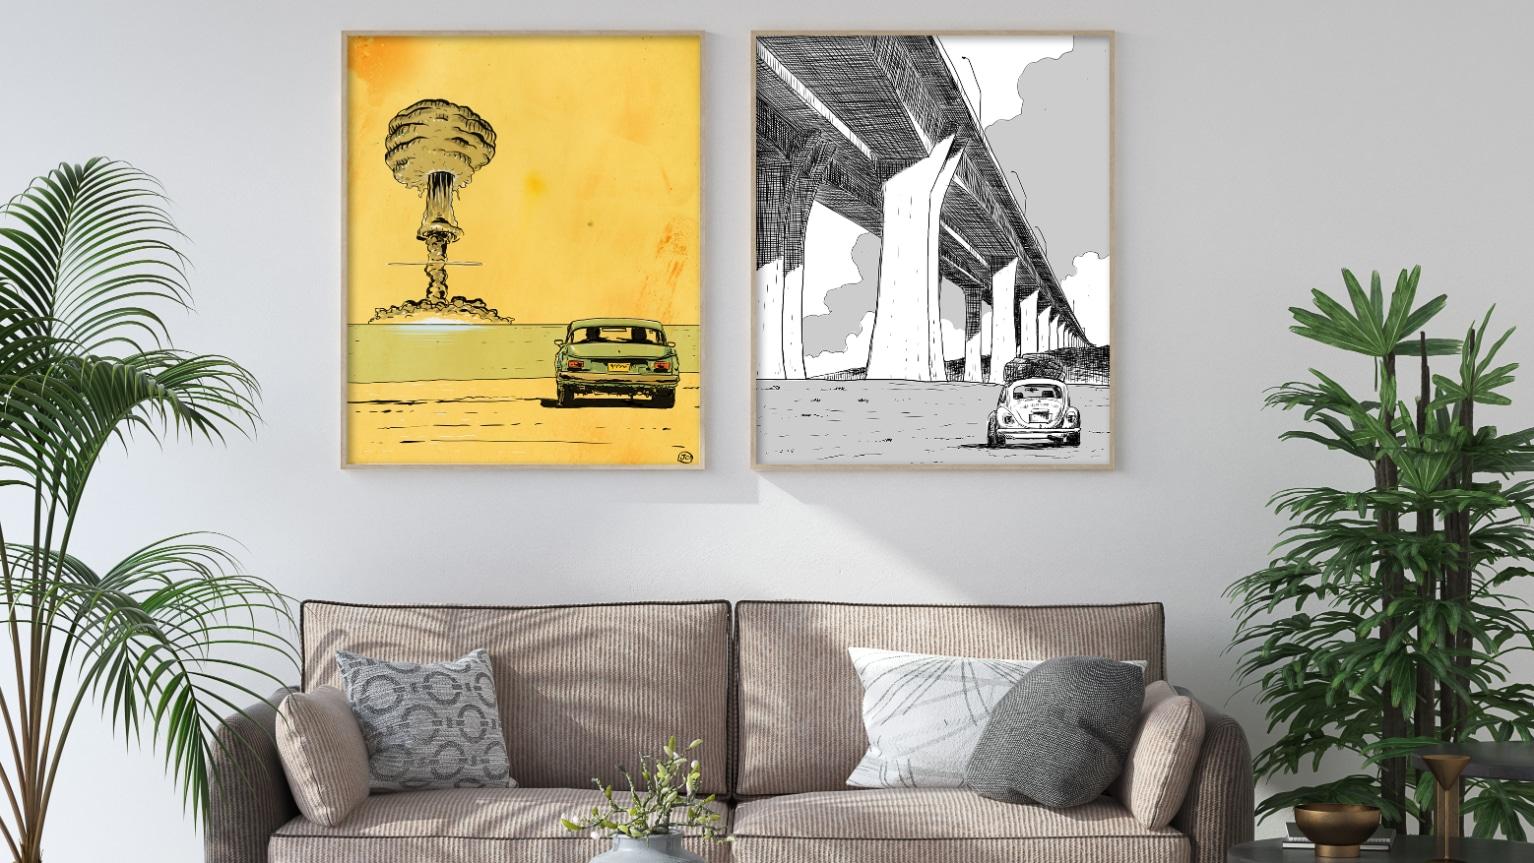 digital comic illustration wall art canvas framed prints